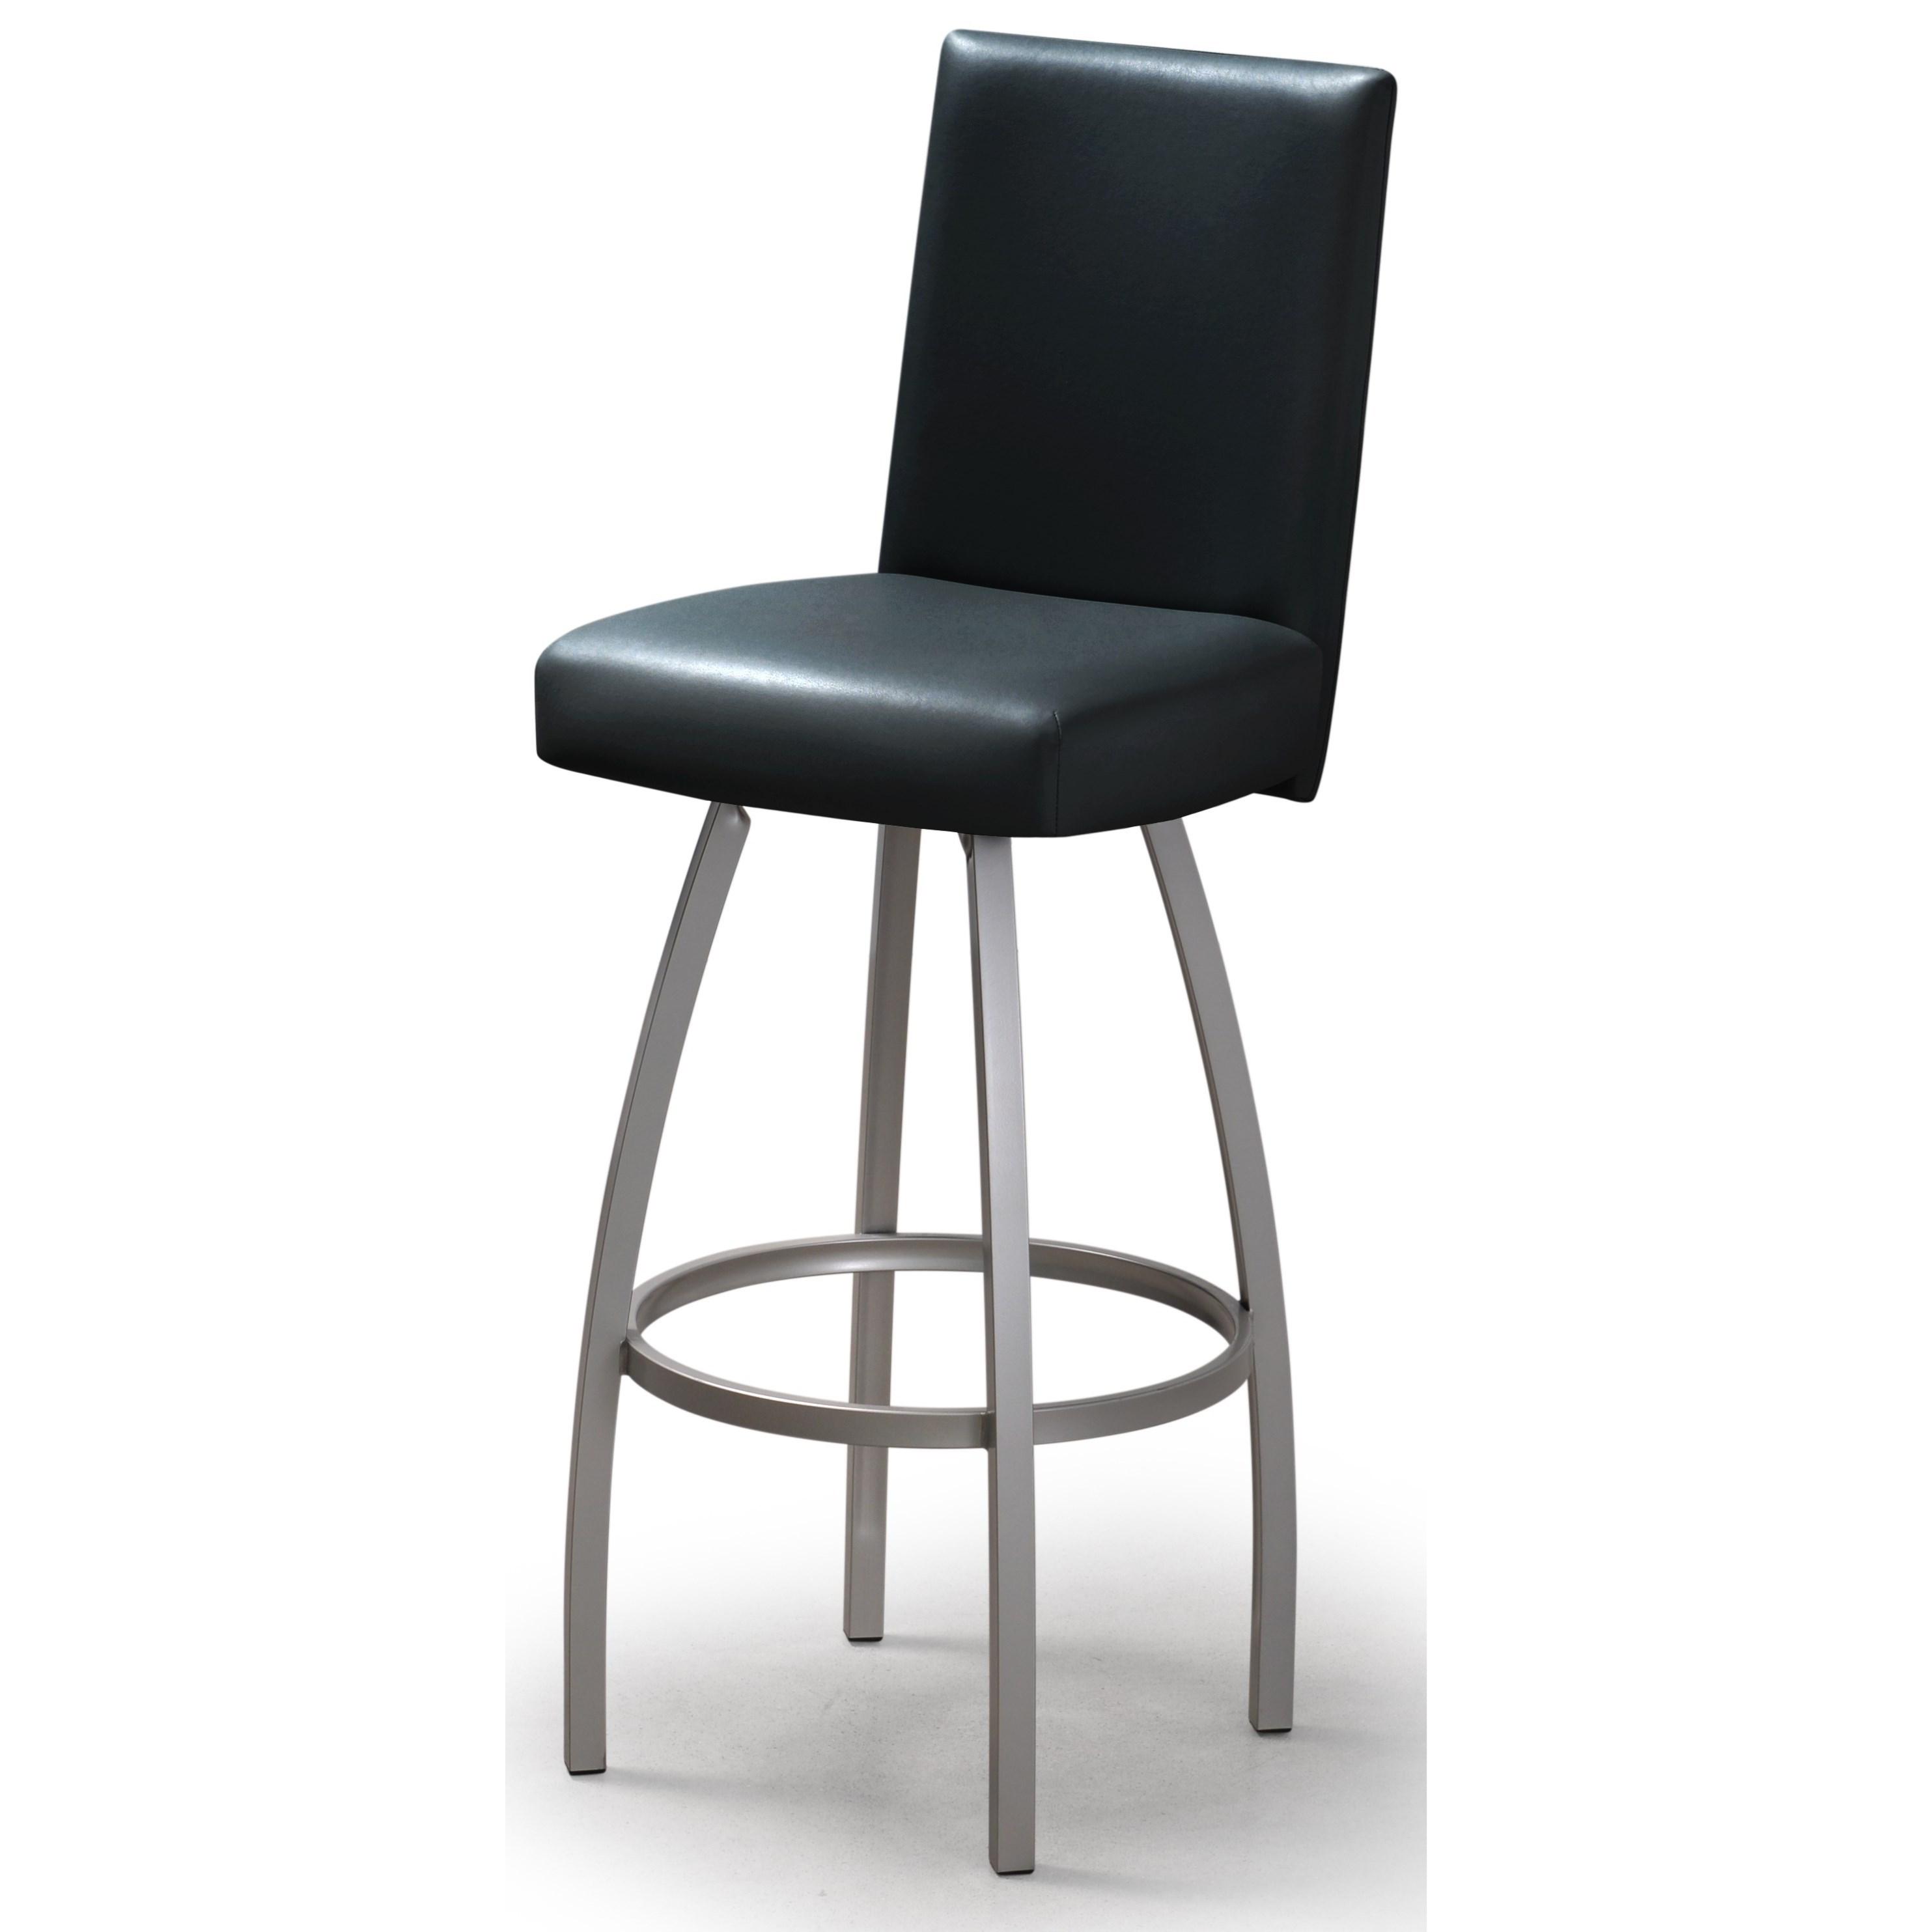 Trica Contemporary Seating Nicholas Swivel Bar Stool